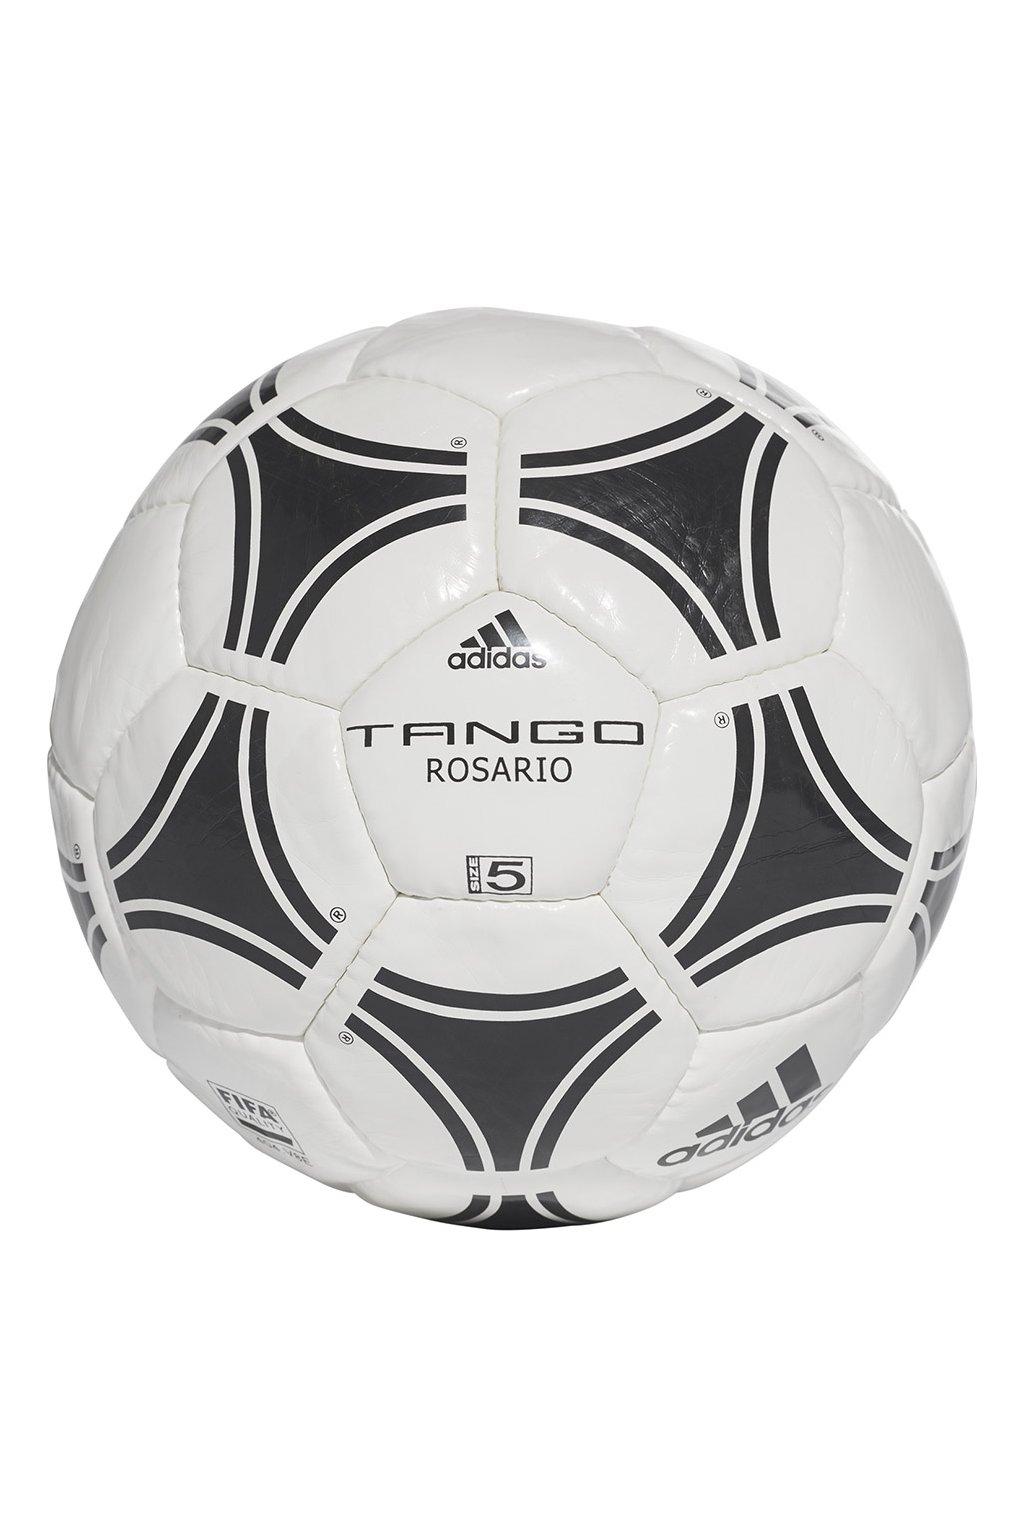 Futbalová lopta Adidas Tango Rosario FIFA 5 čiernobiela 656927